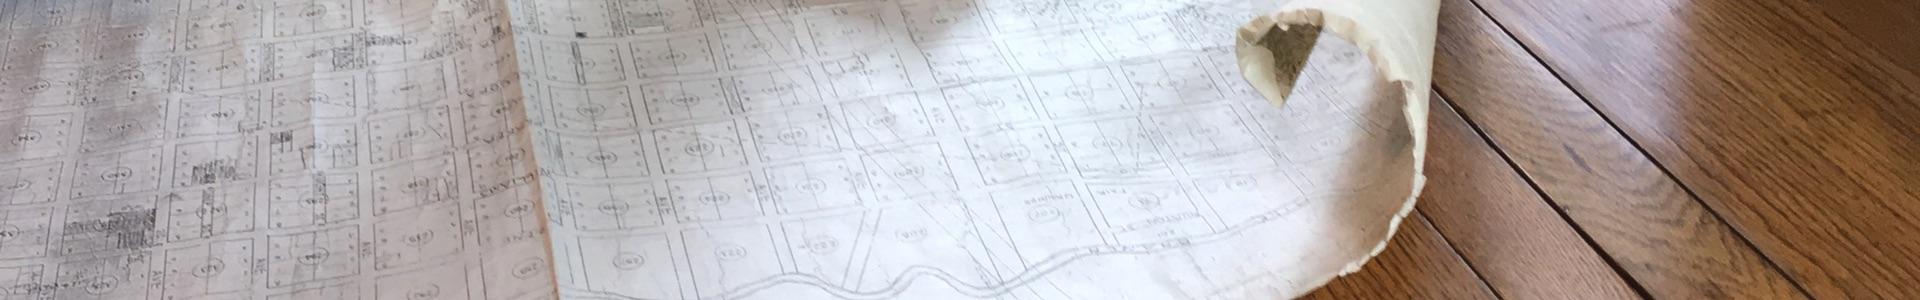 franklinton LA map property law real estate attorney